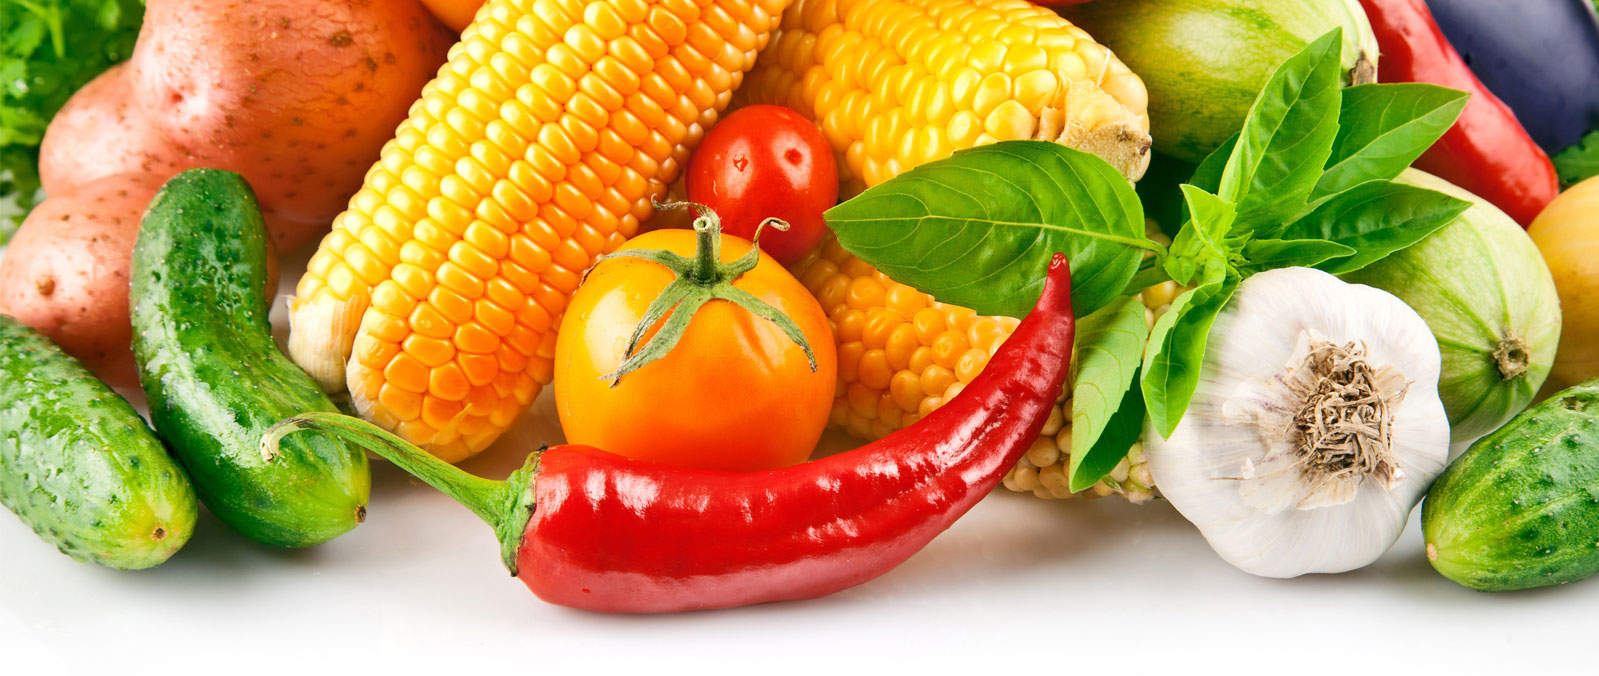 vegetable-1600